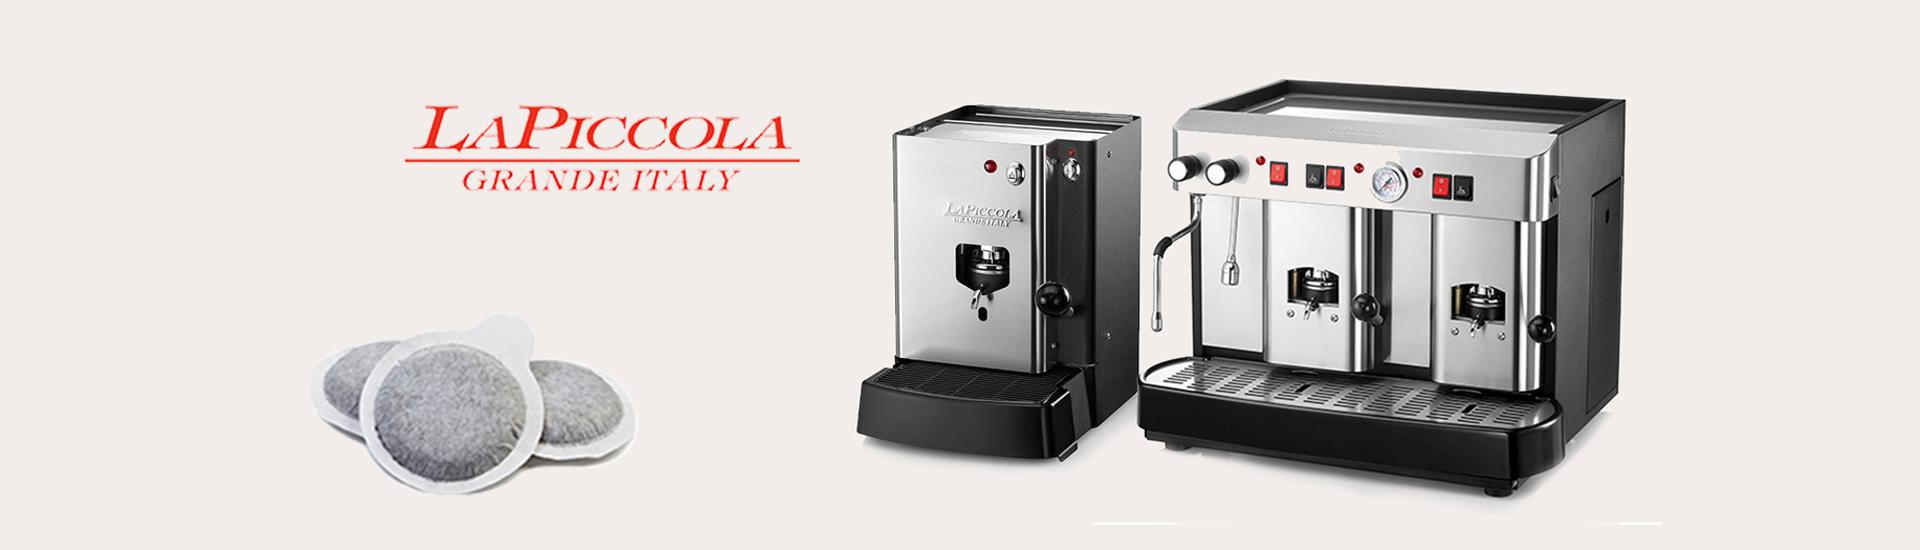 La Piccola - Platinum Caffè